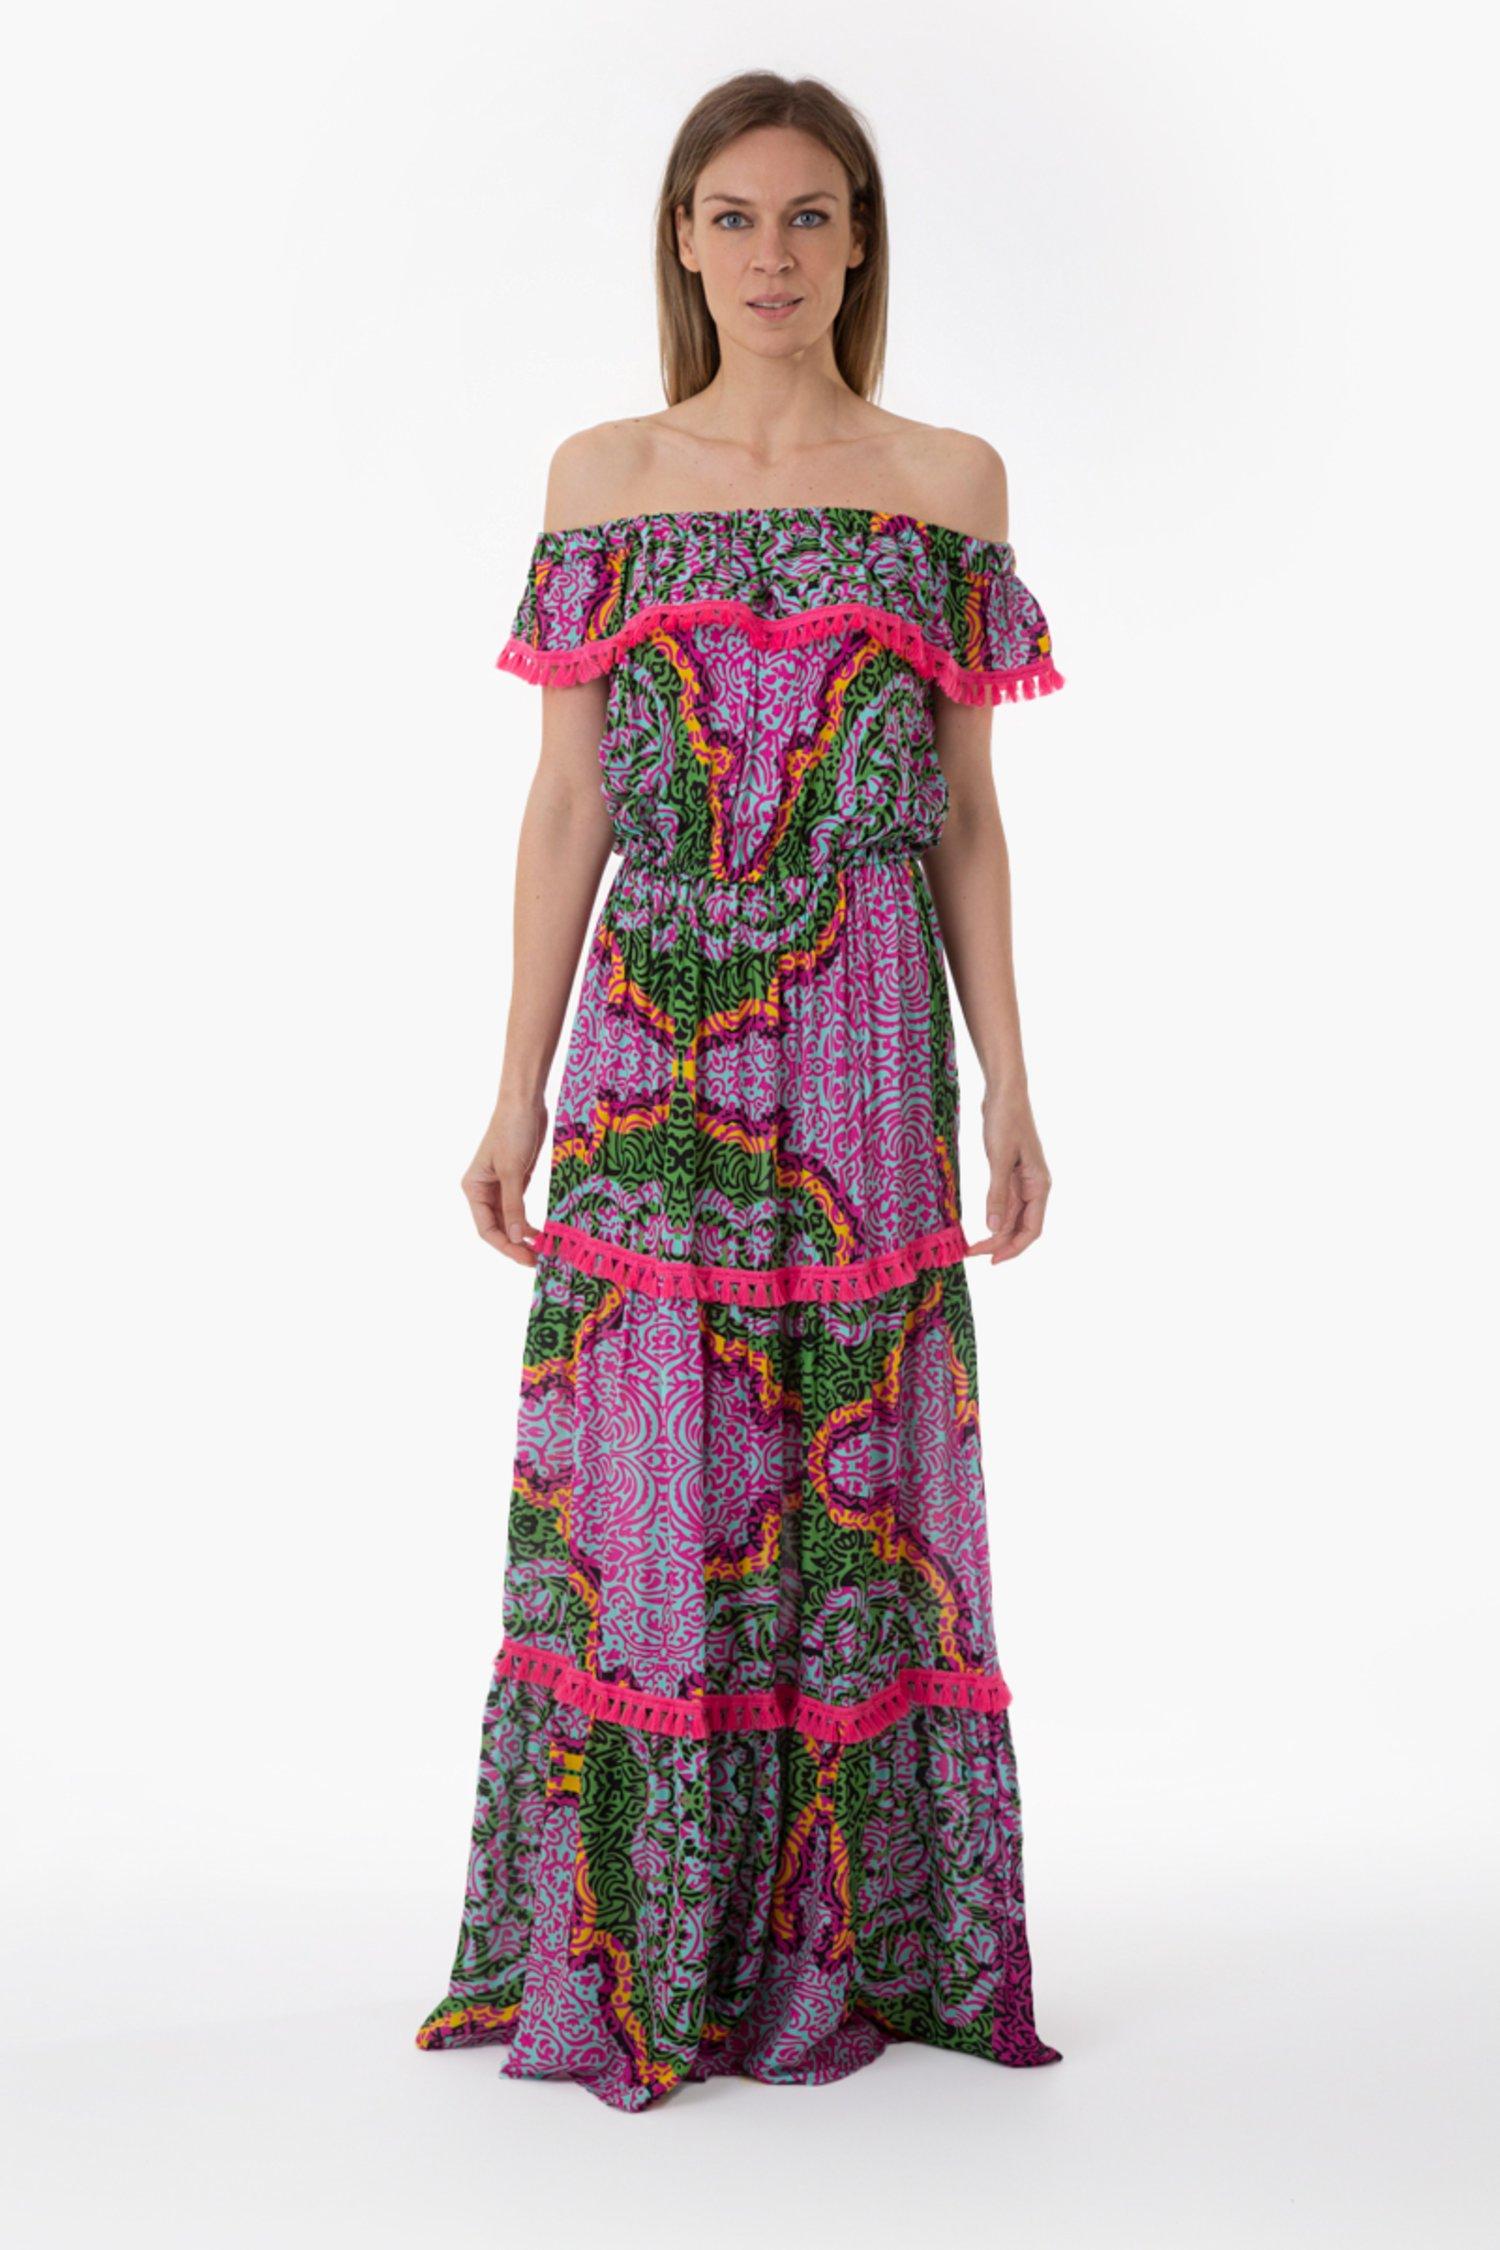 PRINTED VISCOSE LONG DRESS WITH FRILLS - India Pop Fuxia